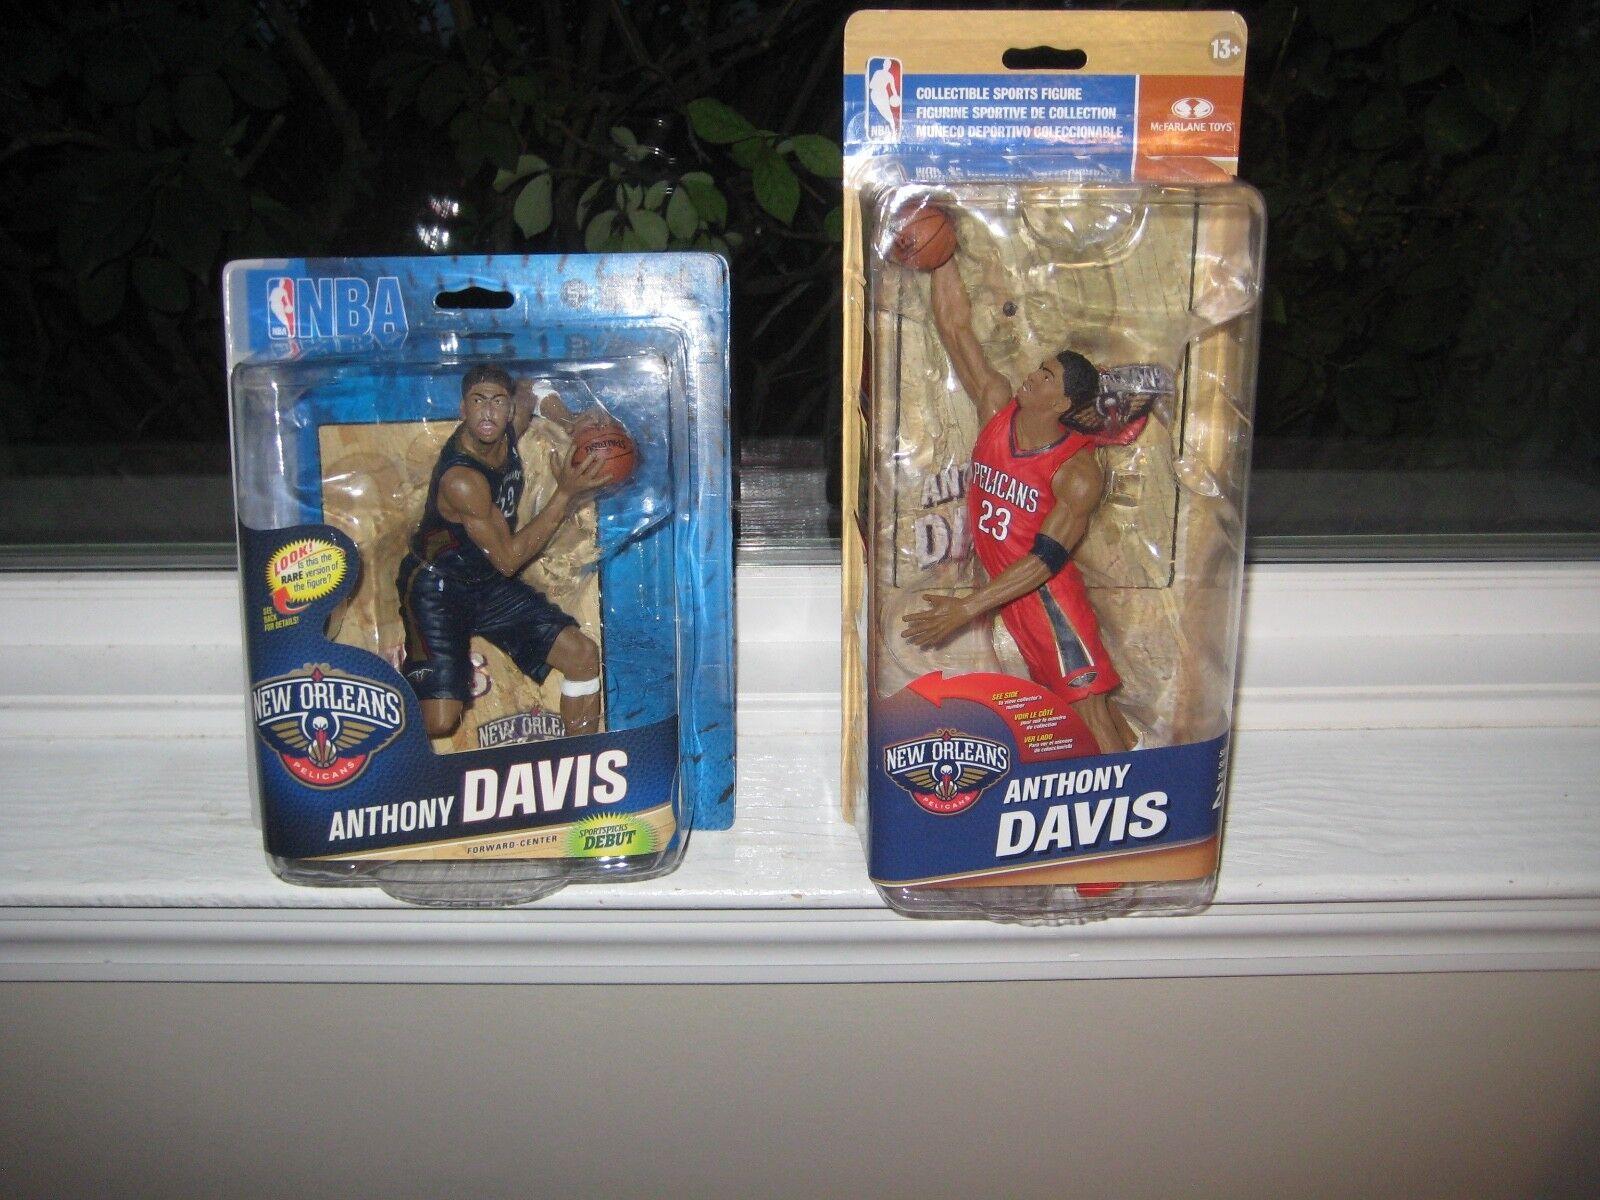 MCFARLANE NBA 24 & 27 Anthony Davis coleccionista nivel Chase variante  441 500 Lote